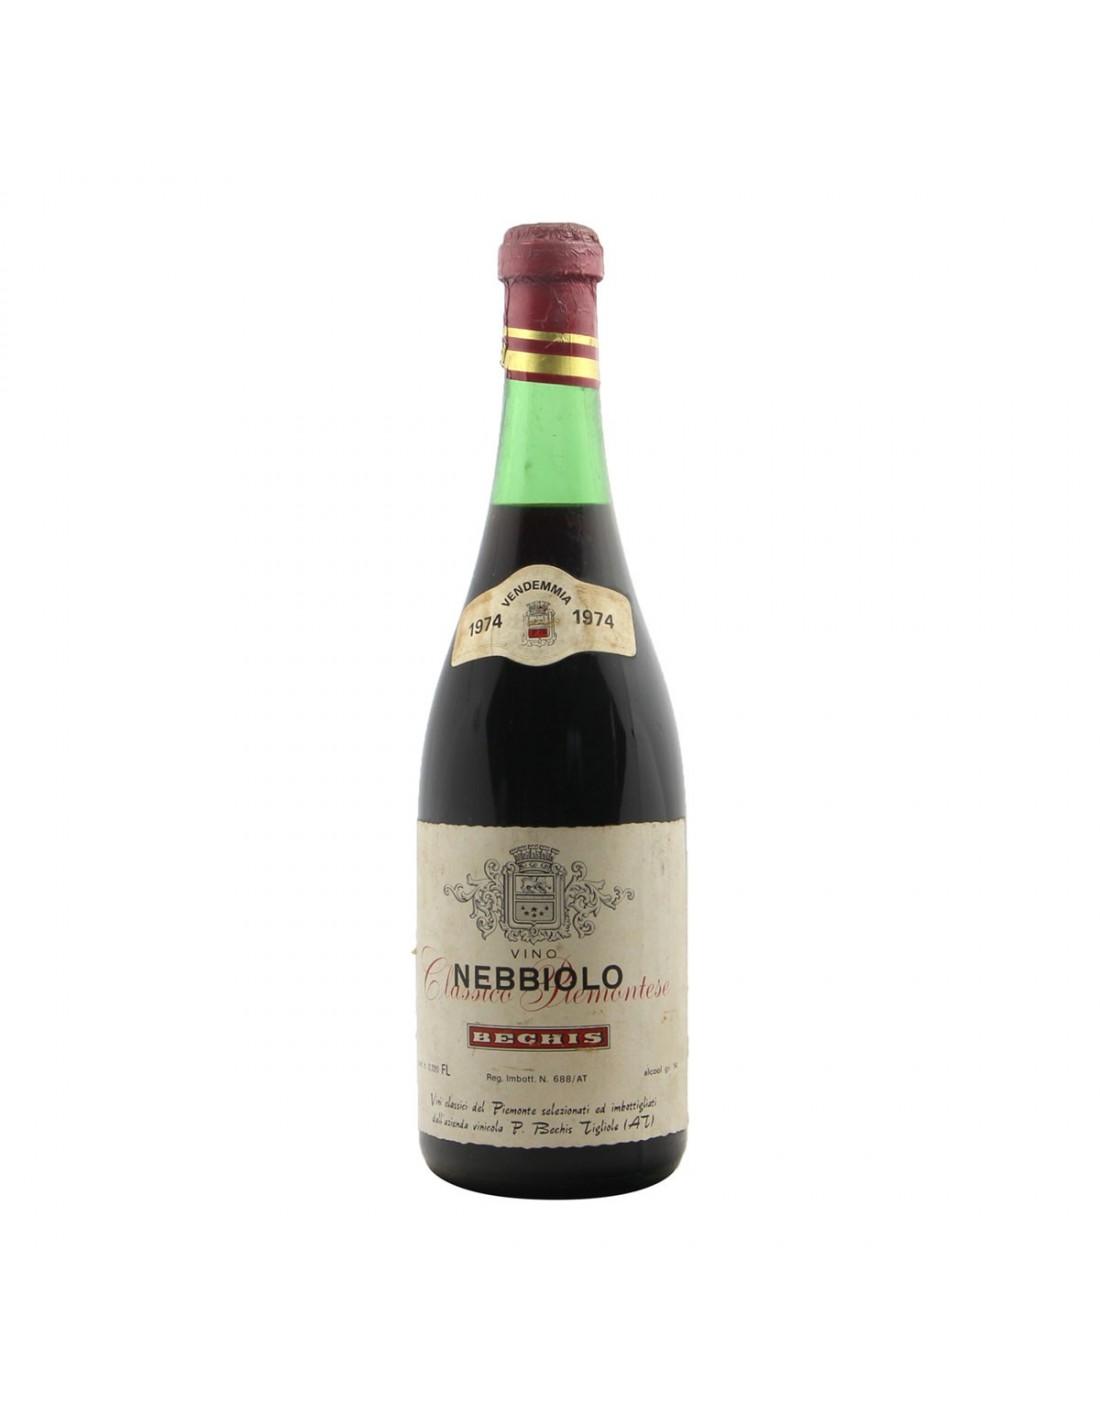 NEBBIOLO CLASSICO PIEMONTESE 1974 BECHIS Grandi Bottiglie